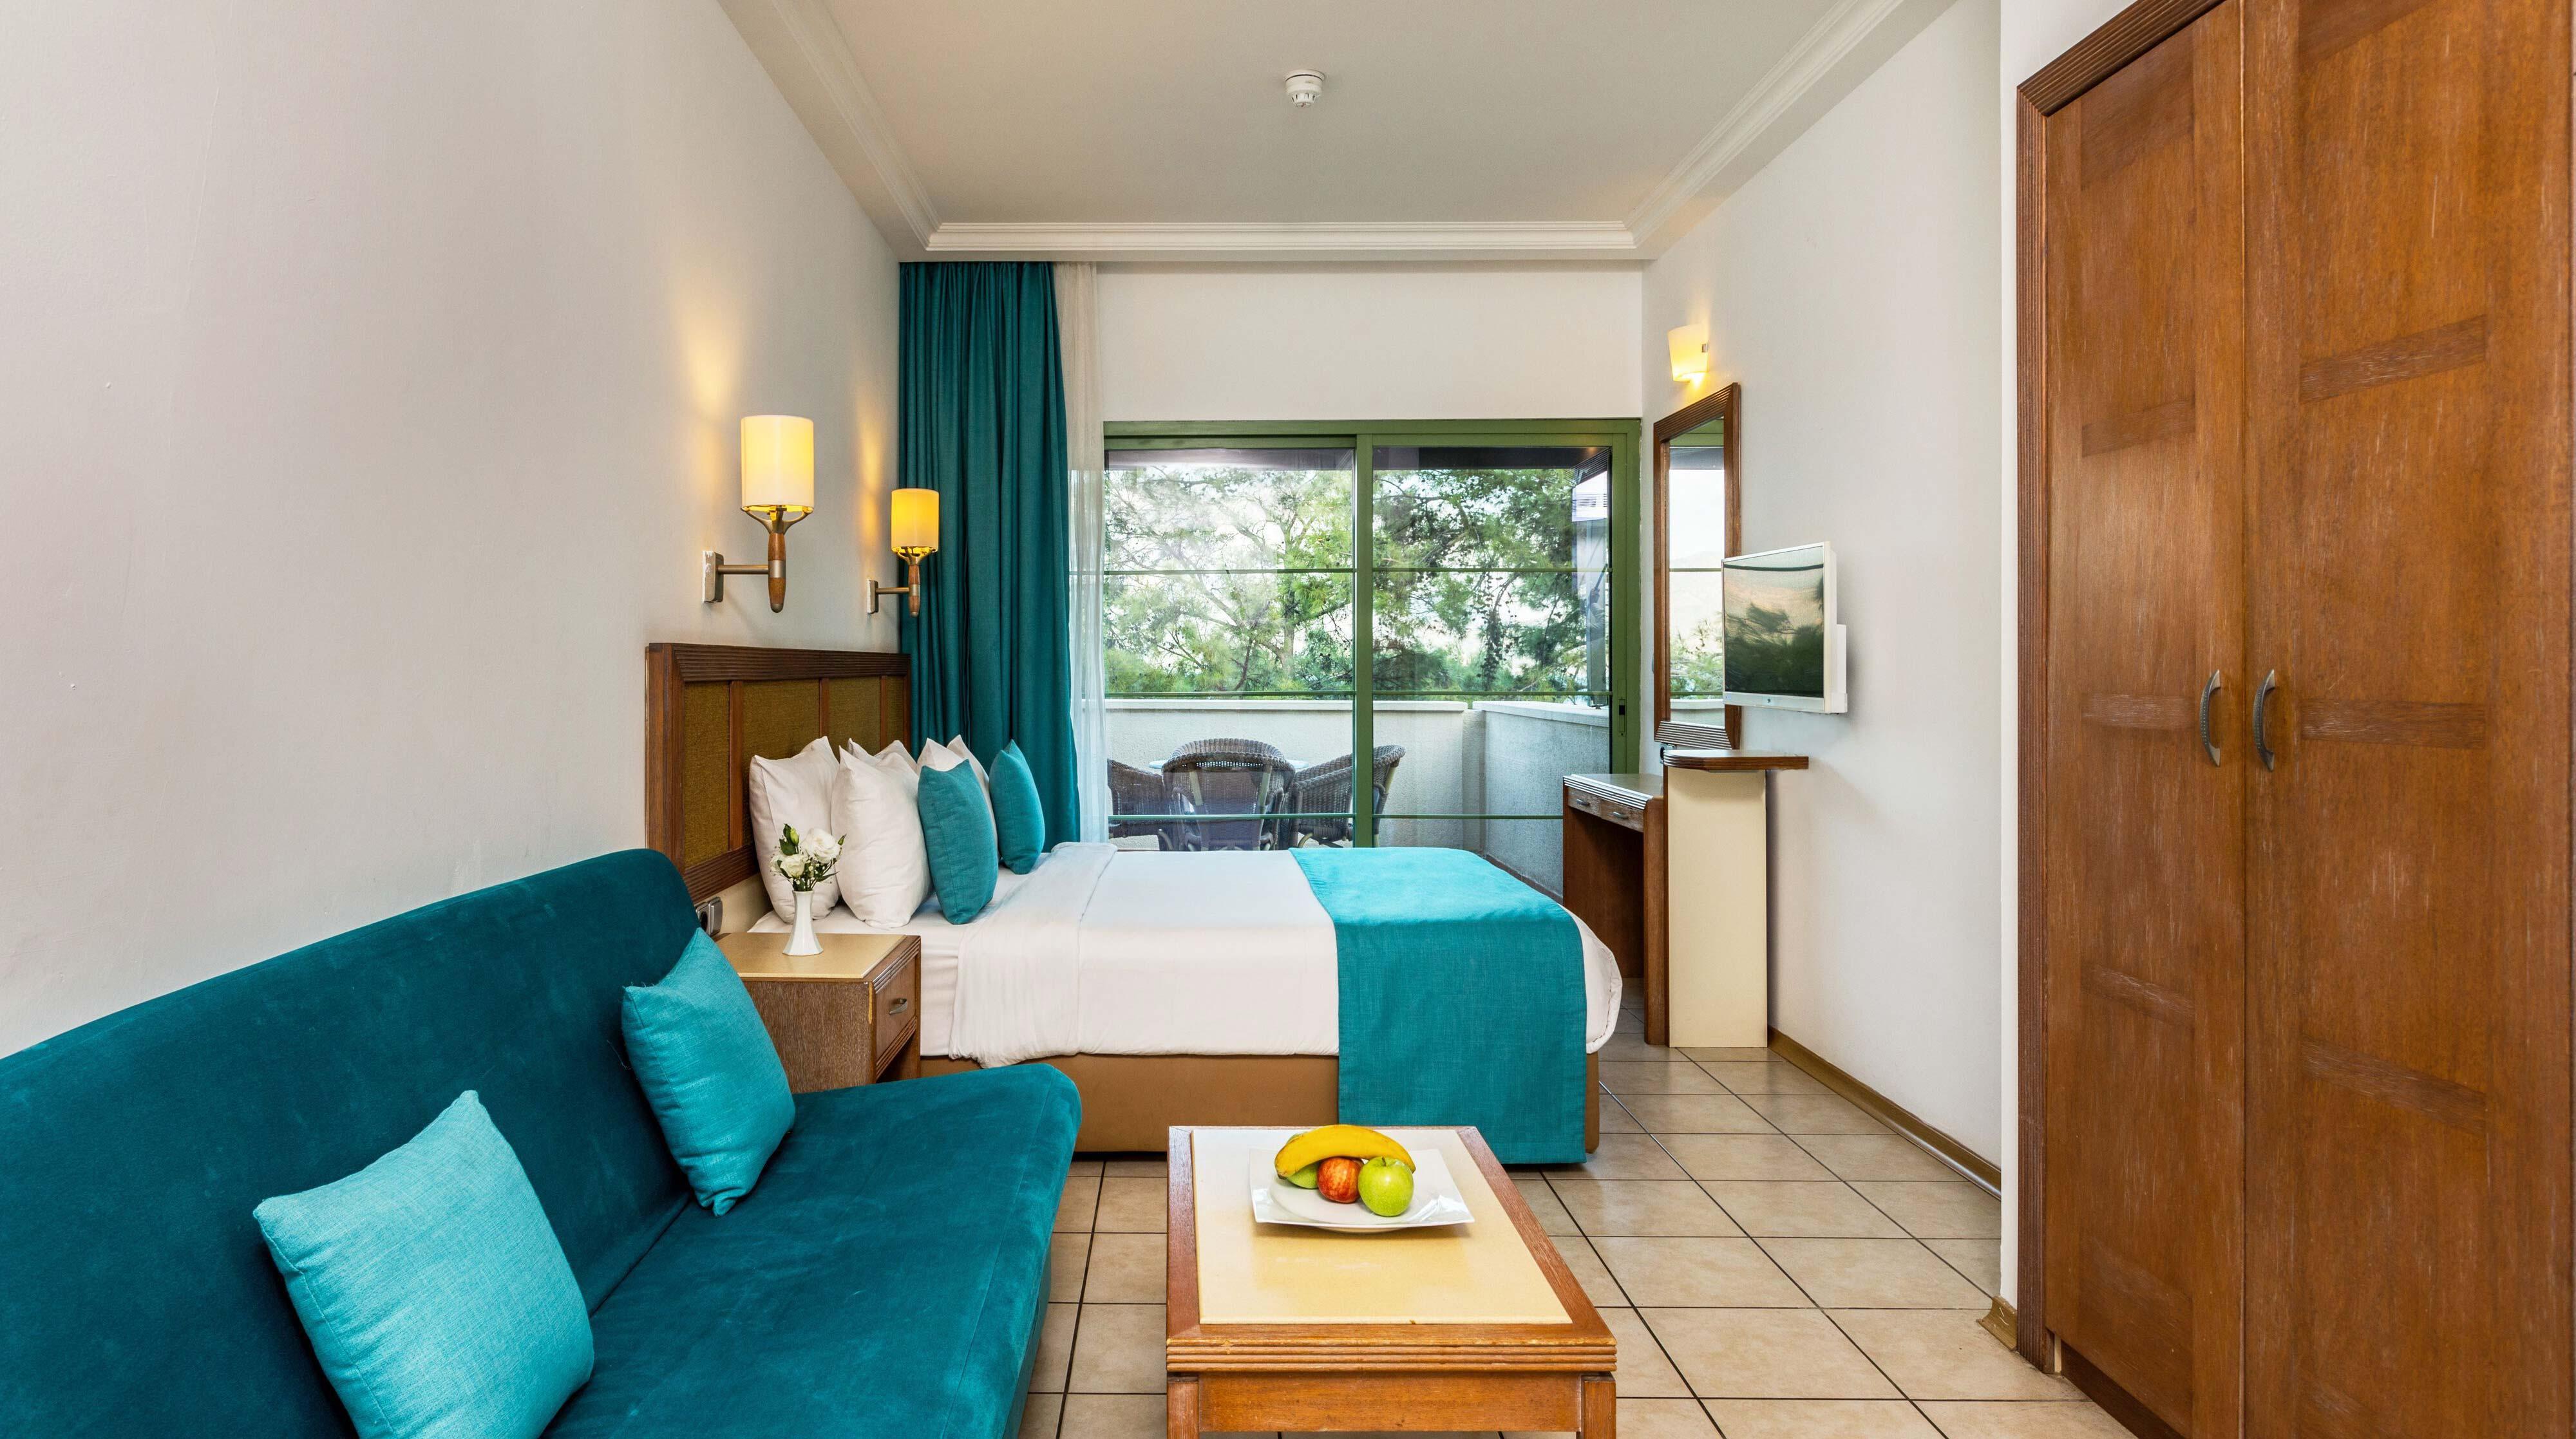 Two Bedroom Bungalow